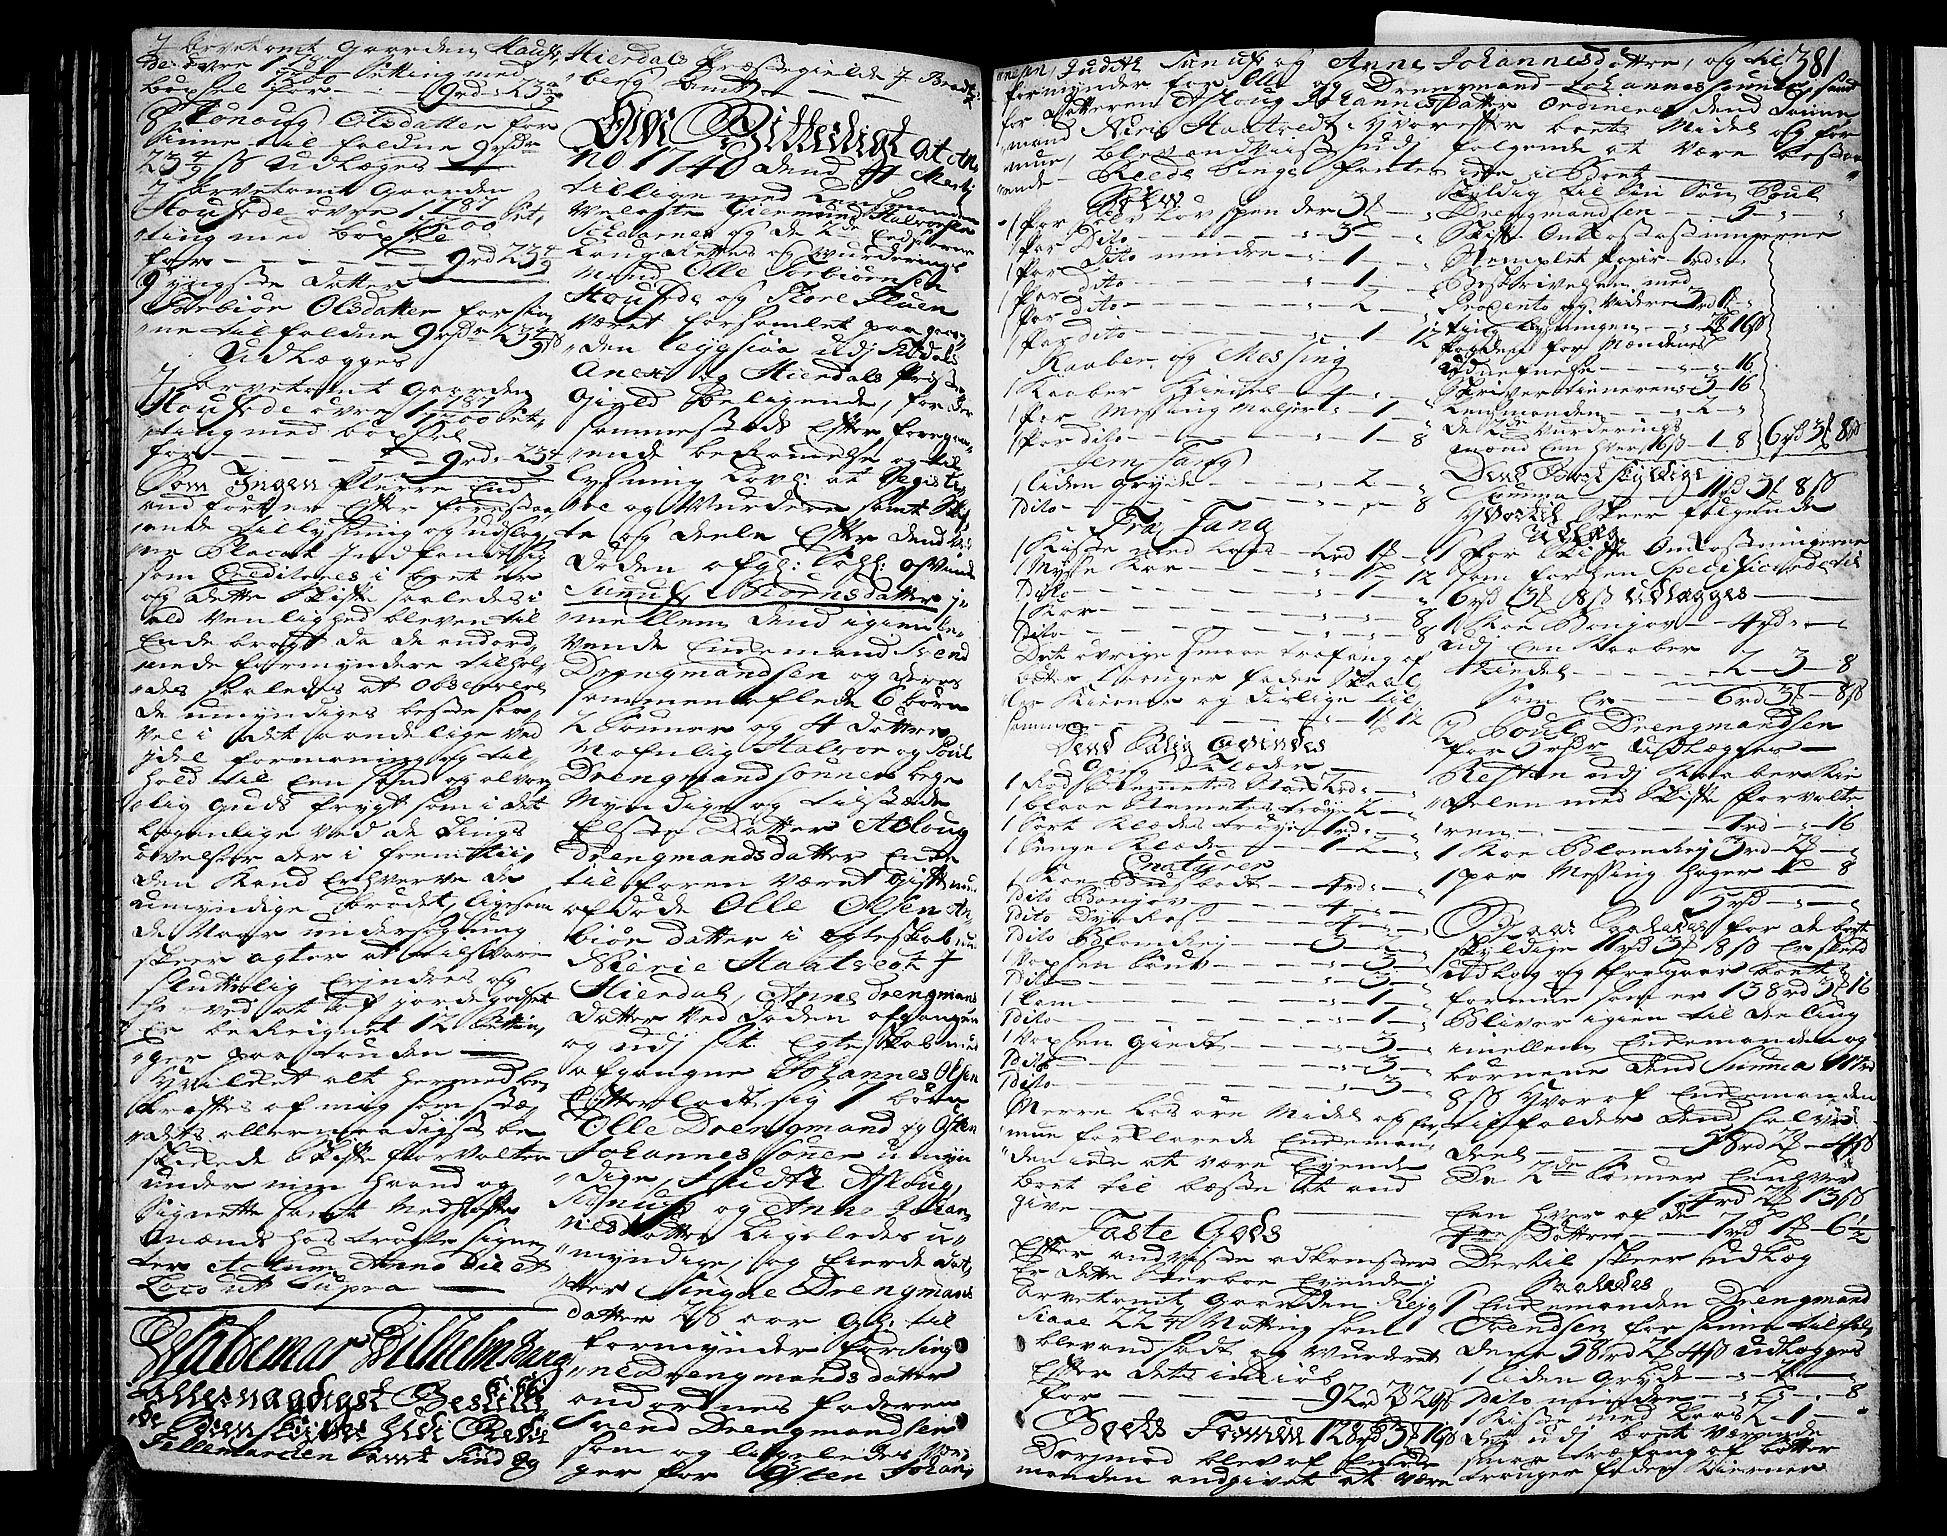 SAKO, Nedre Telemark sorenskriveri, H/Hb/Hba/L0011: Skifteprotokoll, 1736-1740, s. 380b-381a